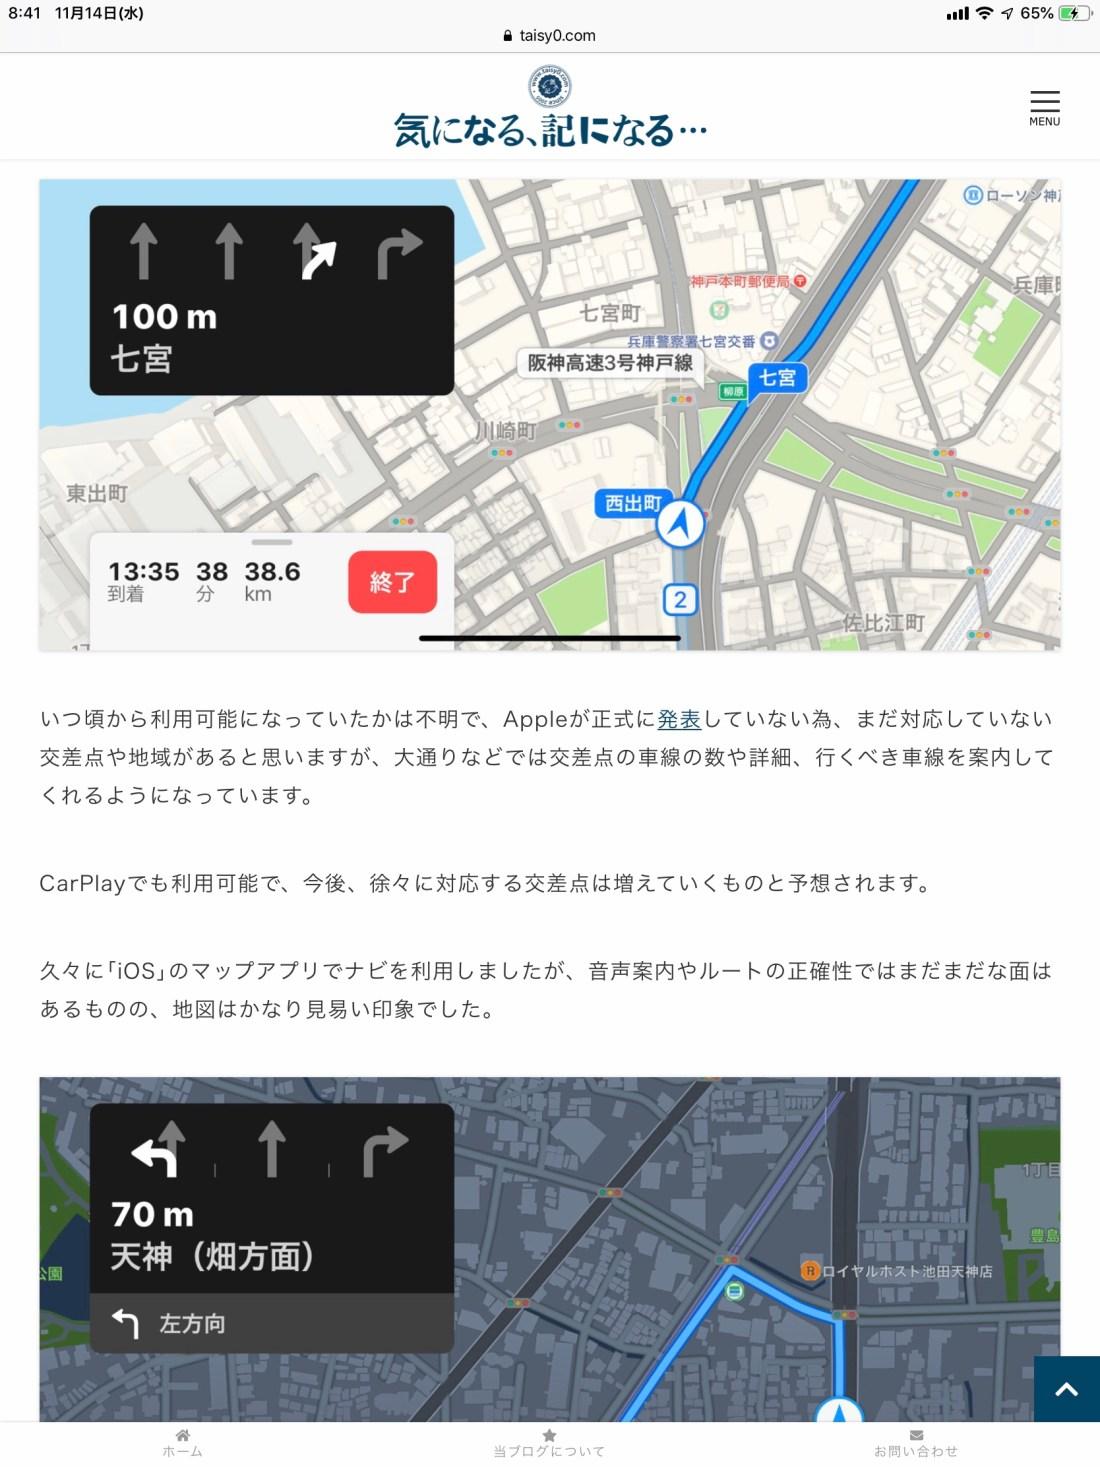 Apple Maps Japan Lane Guidance